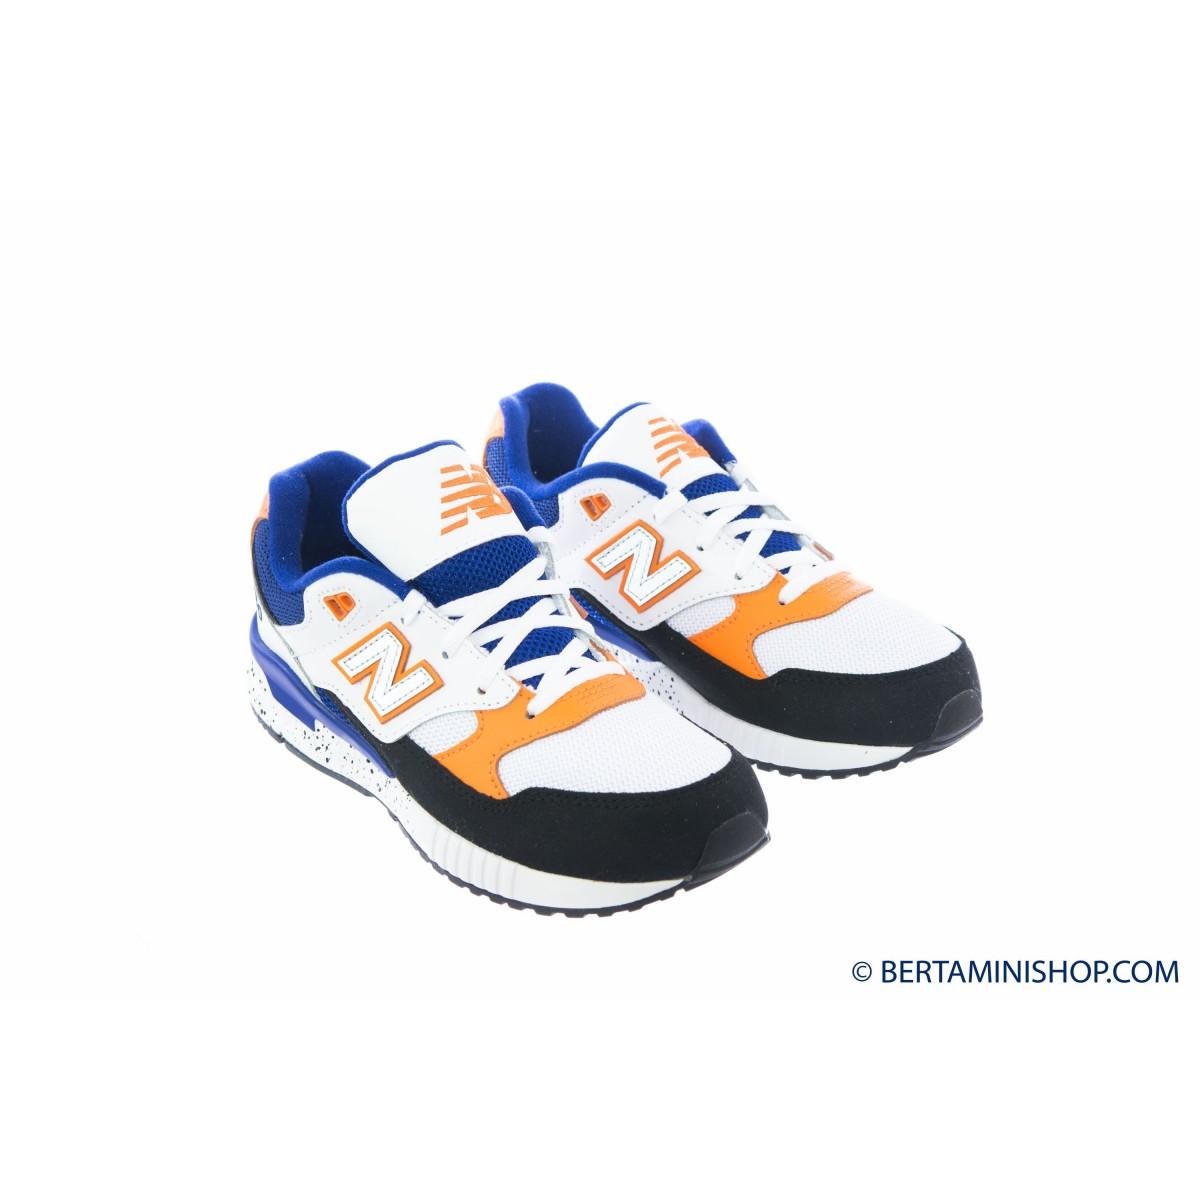 Scarpa New Balance Bambino - KL 530 BO - Bianca azz arancio